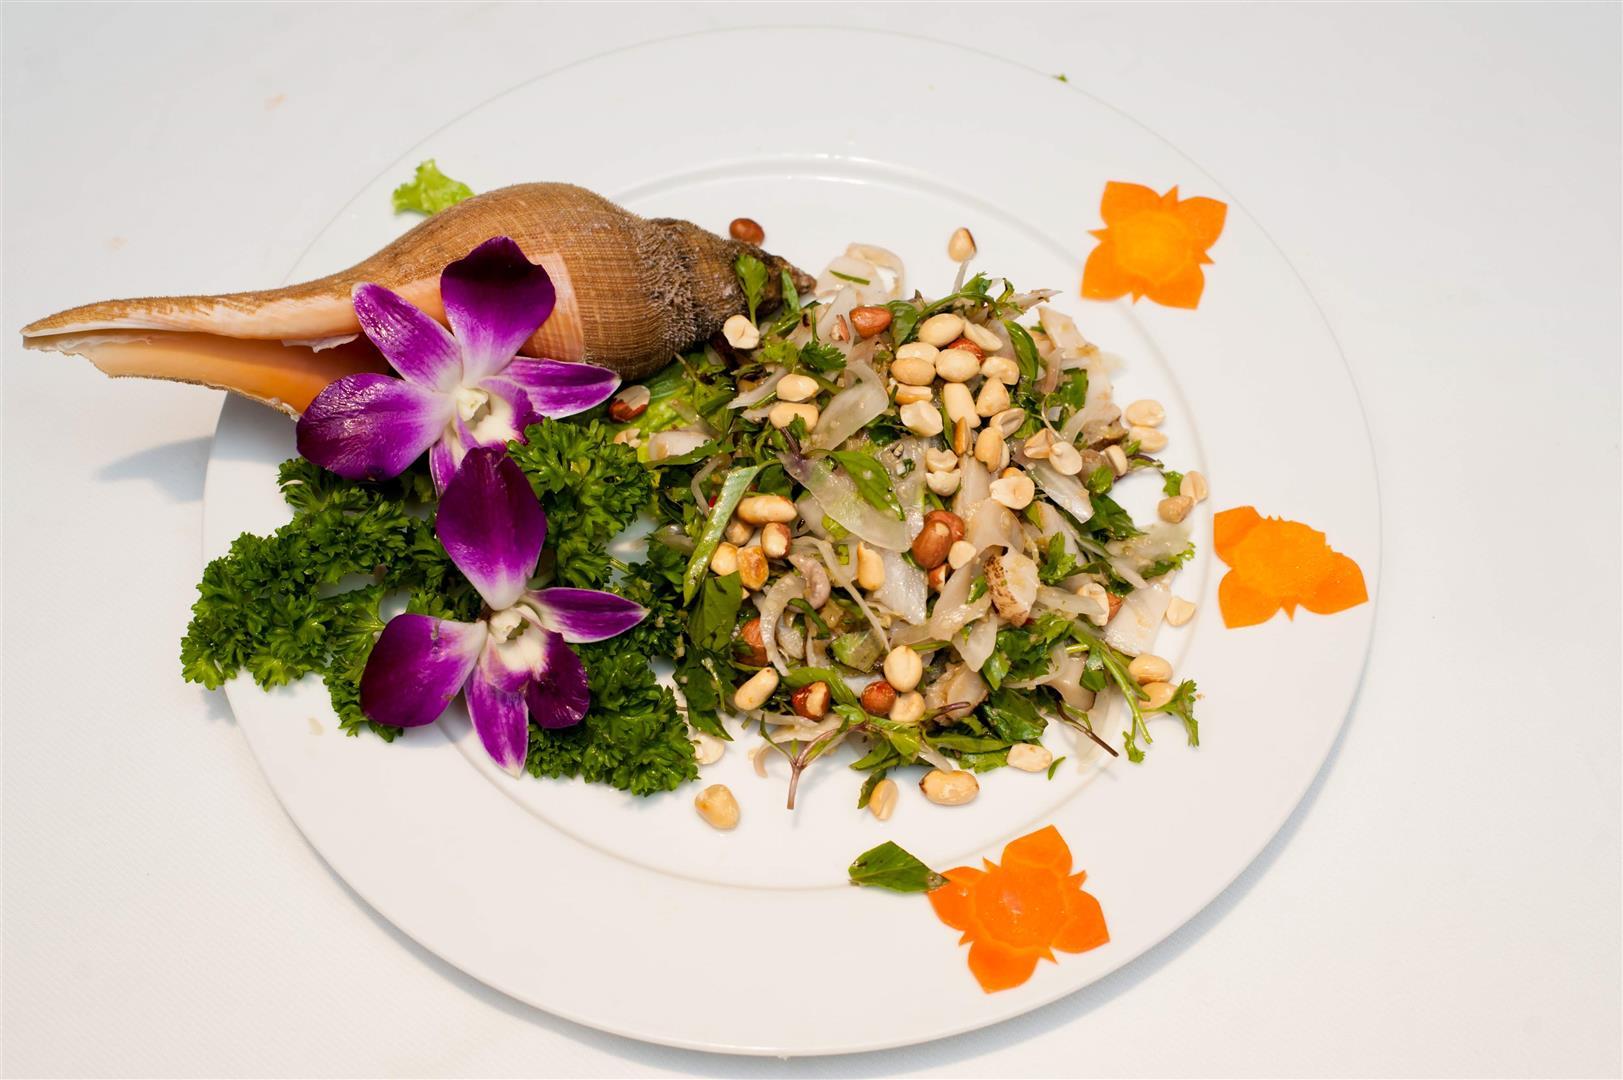 Ốc Kèn Bóp Chua Cay / Trumpet snail Mixed with sour and hot taste